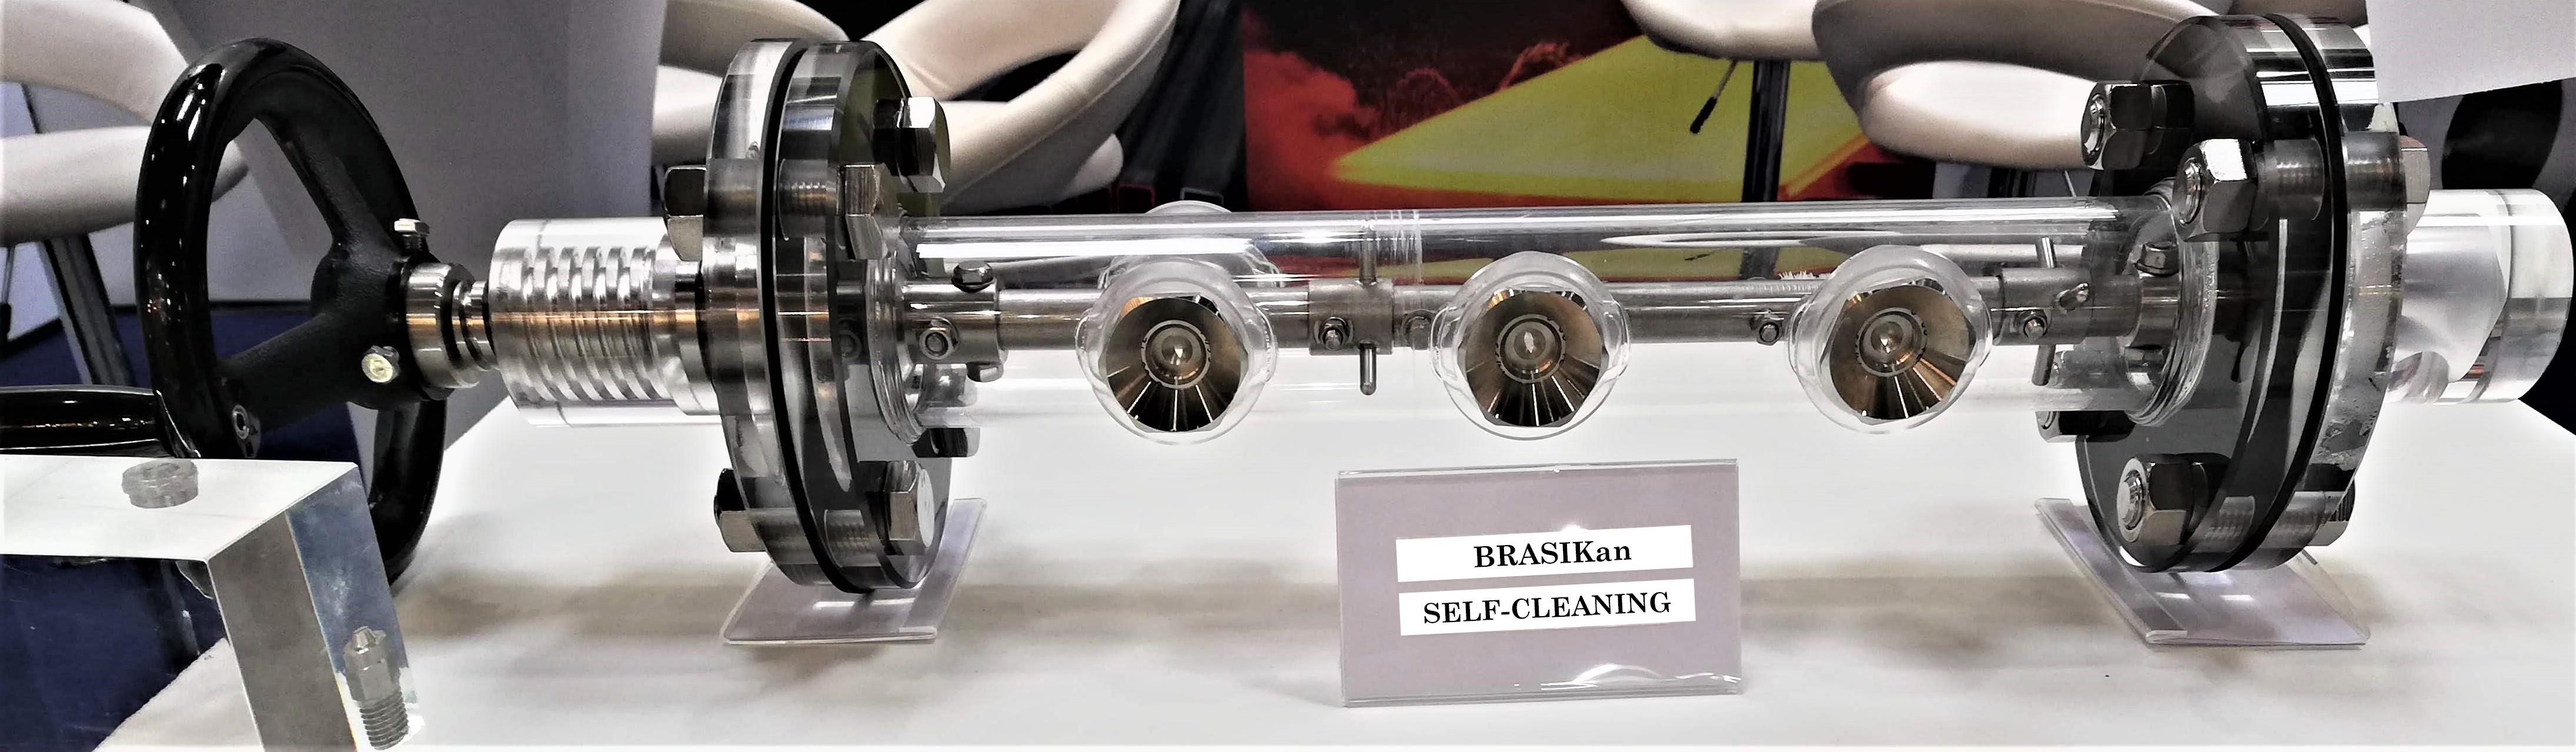 BRASIKan self cleaning nozzle header